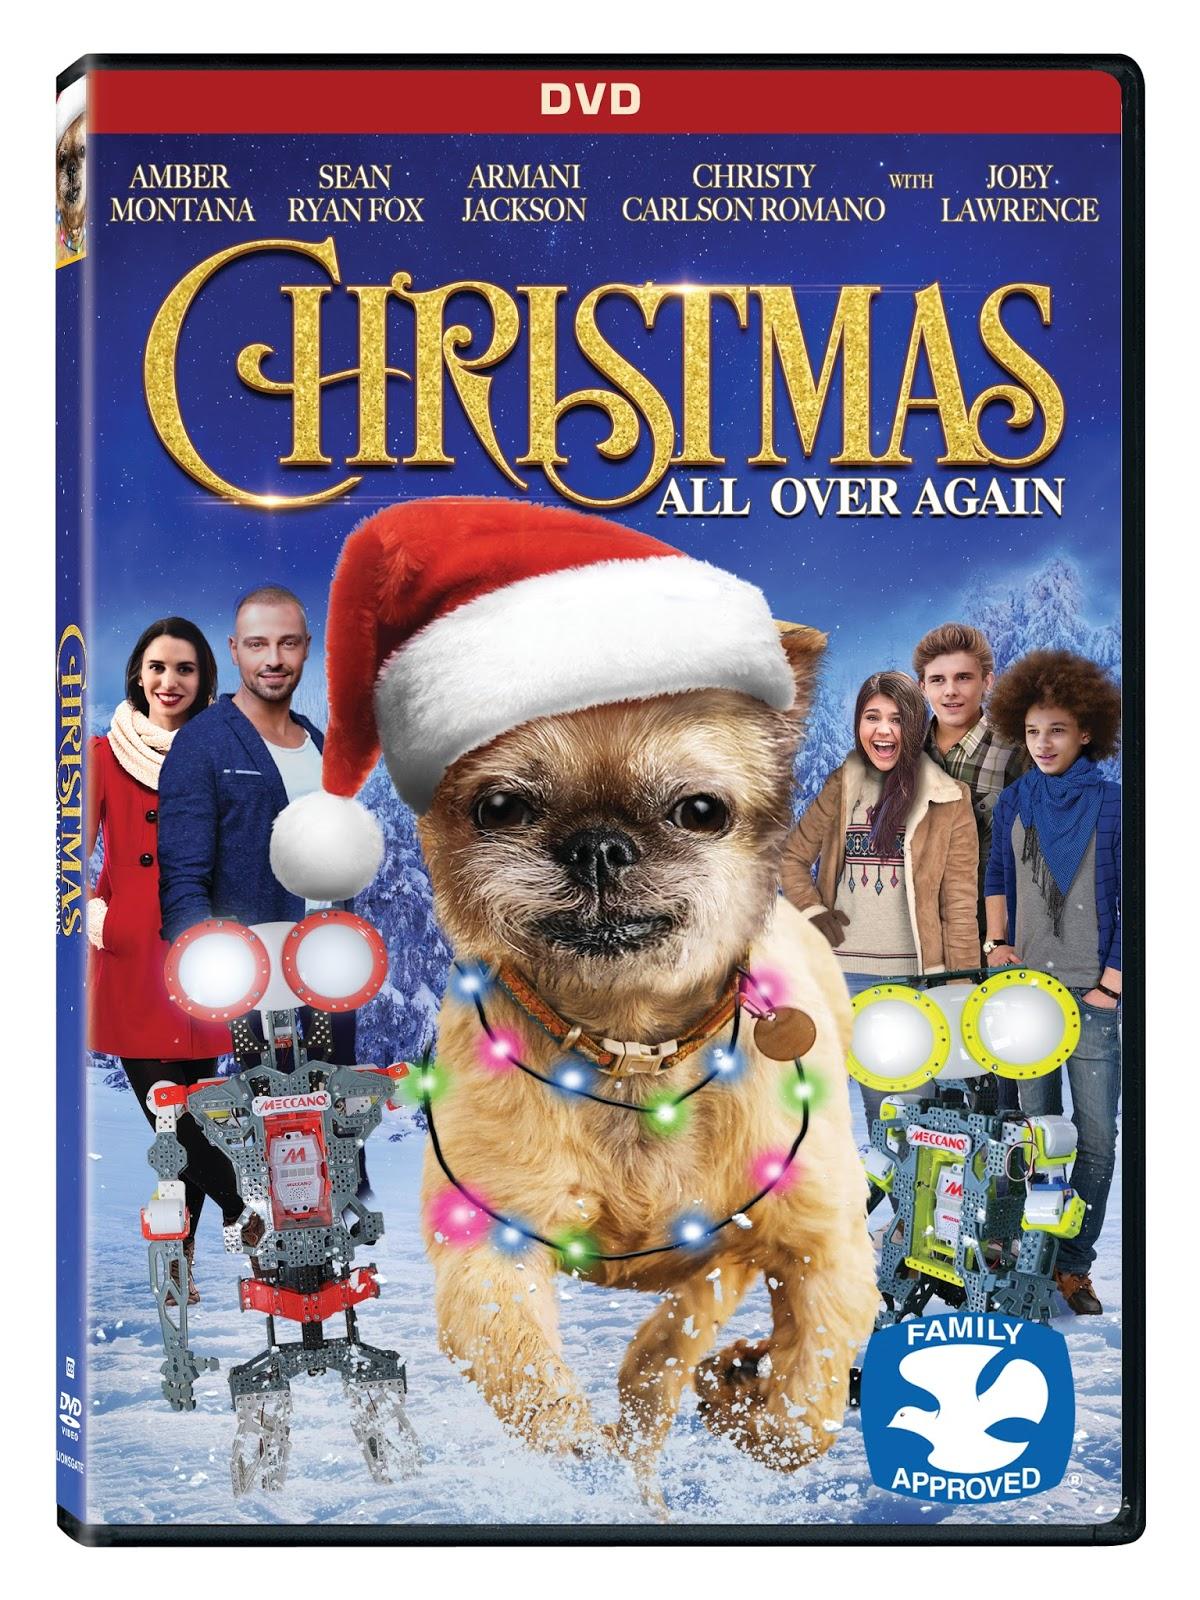 Susan\'s Disney Family: Christmas All Over Again Available on DVD, On ...